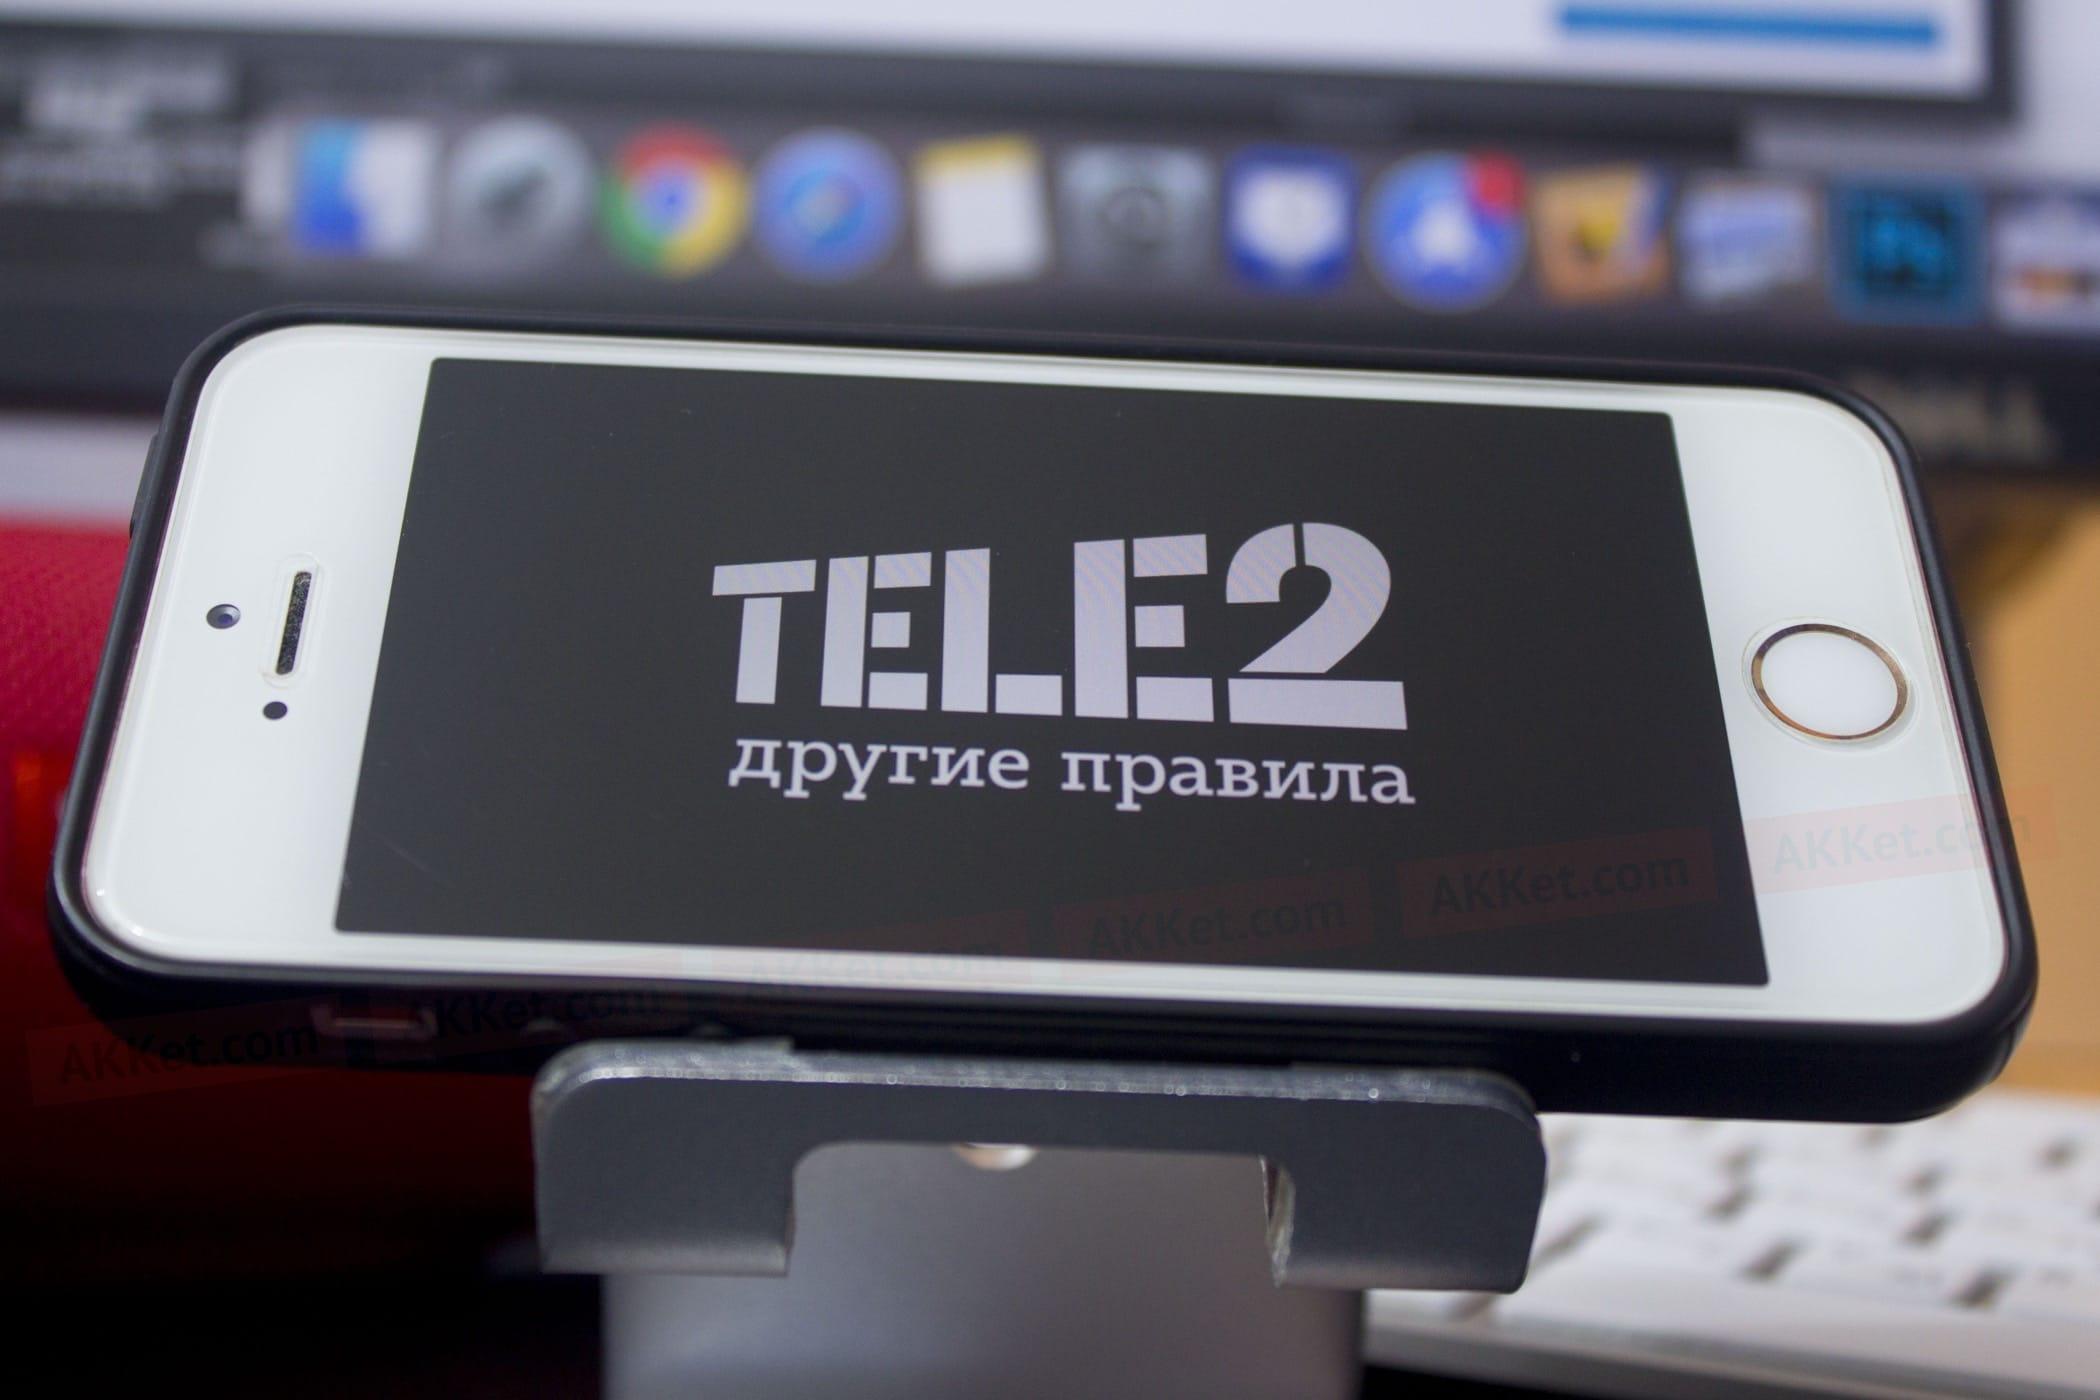 Клиенты Tele2 смогут обменять мин. нагигабайты интернет-трафика